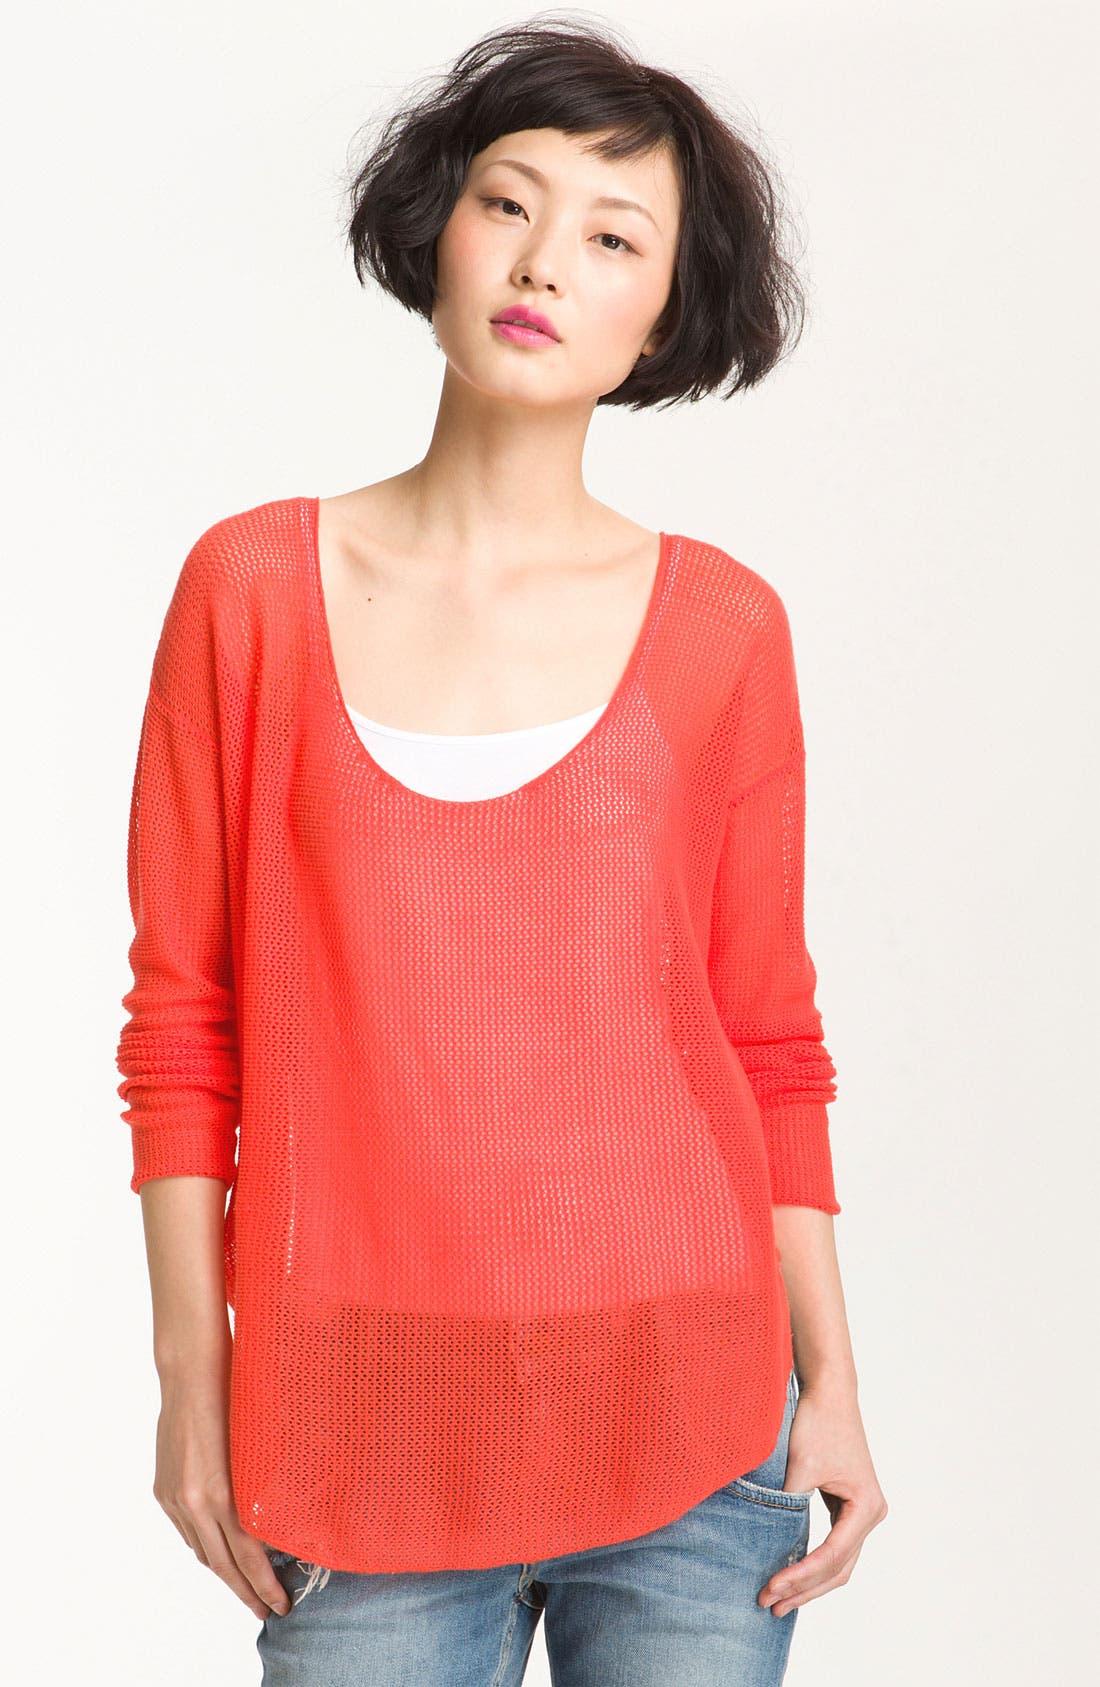 Main Image - Soft Joie 'Nia' Sheer Oversized Mesh Top